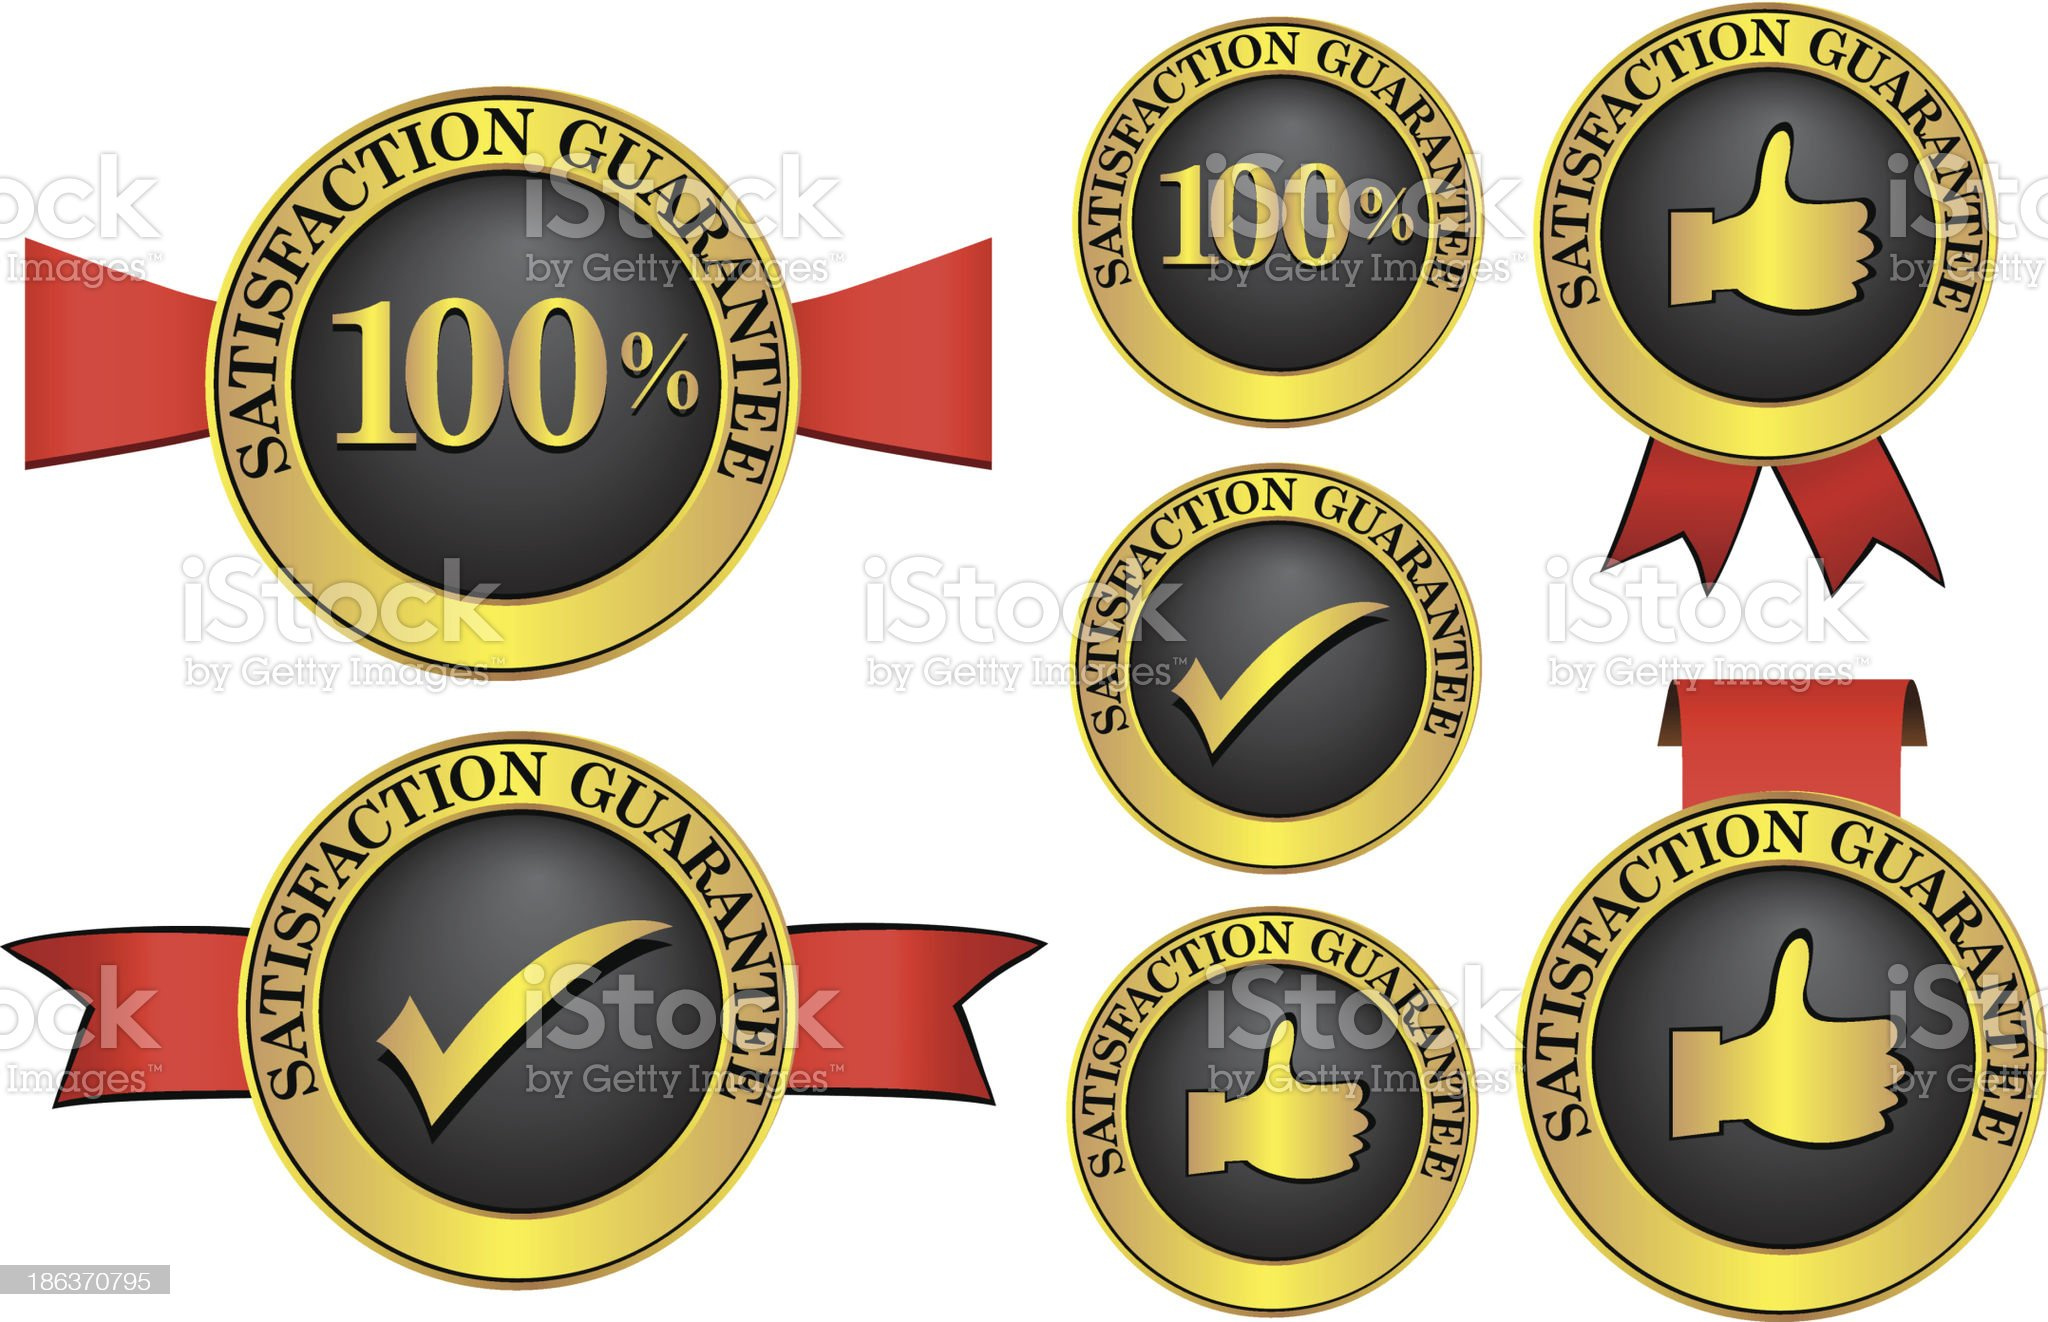 Satisfaction guaranteed label royalty-free stock vector art